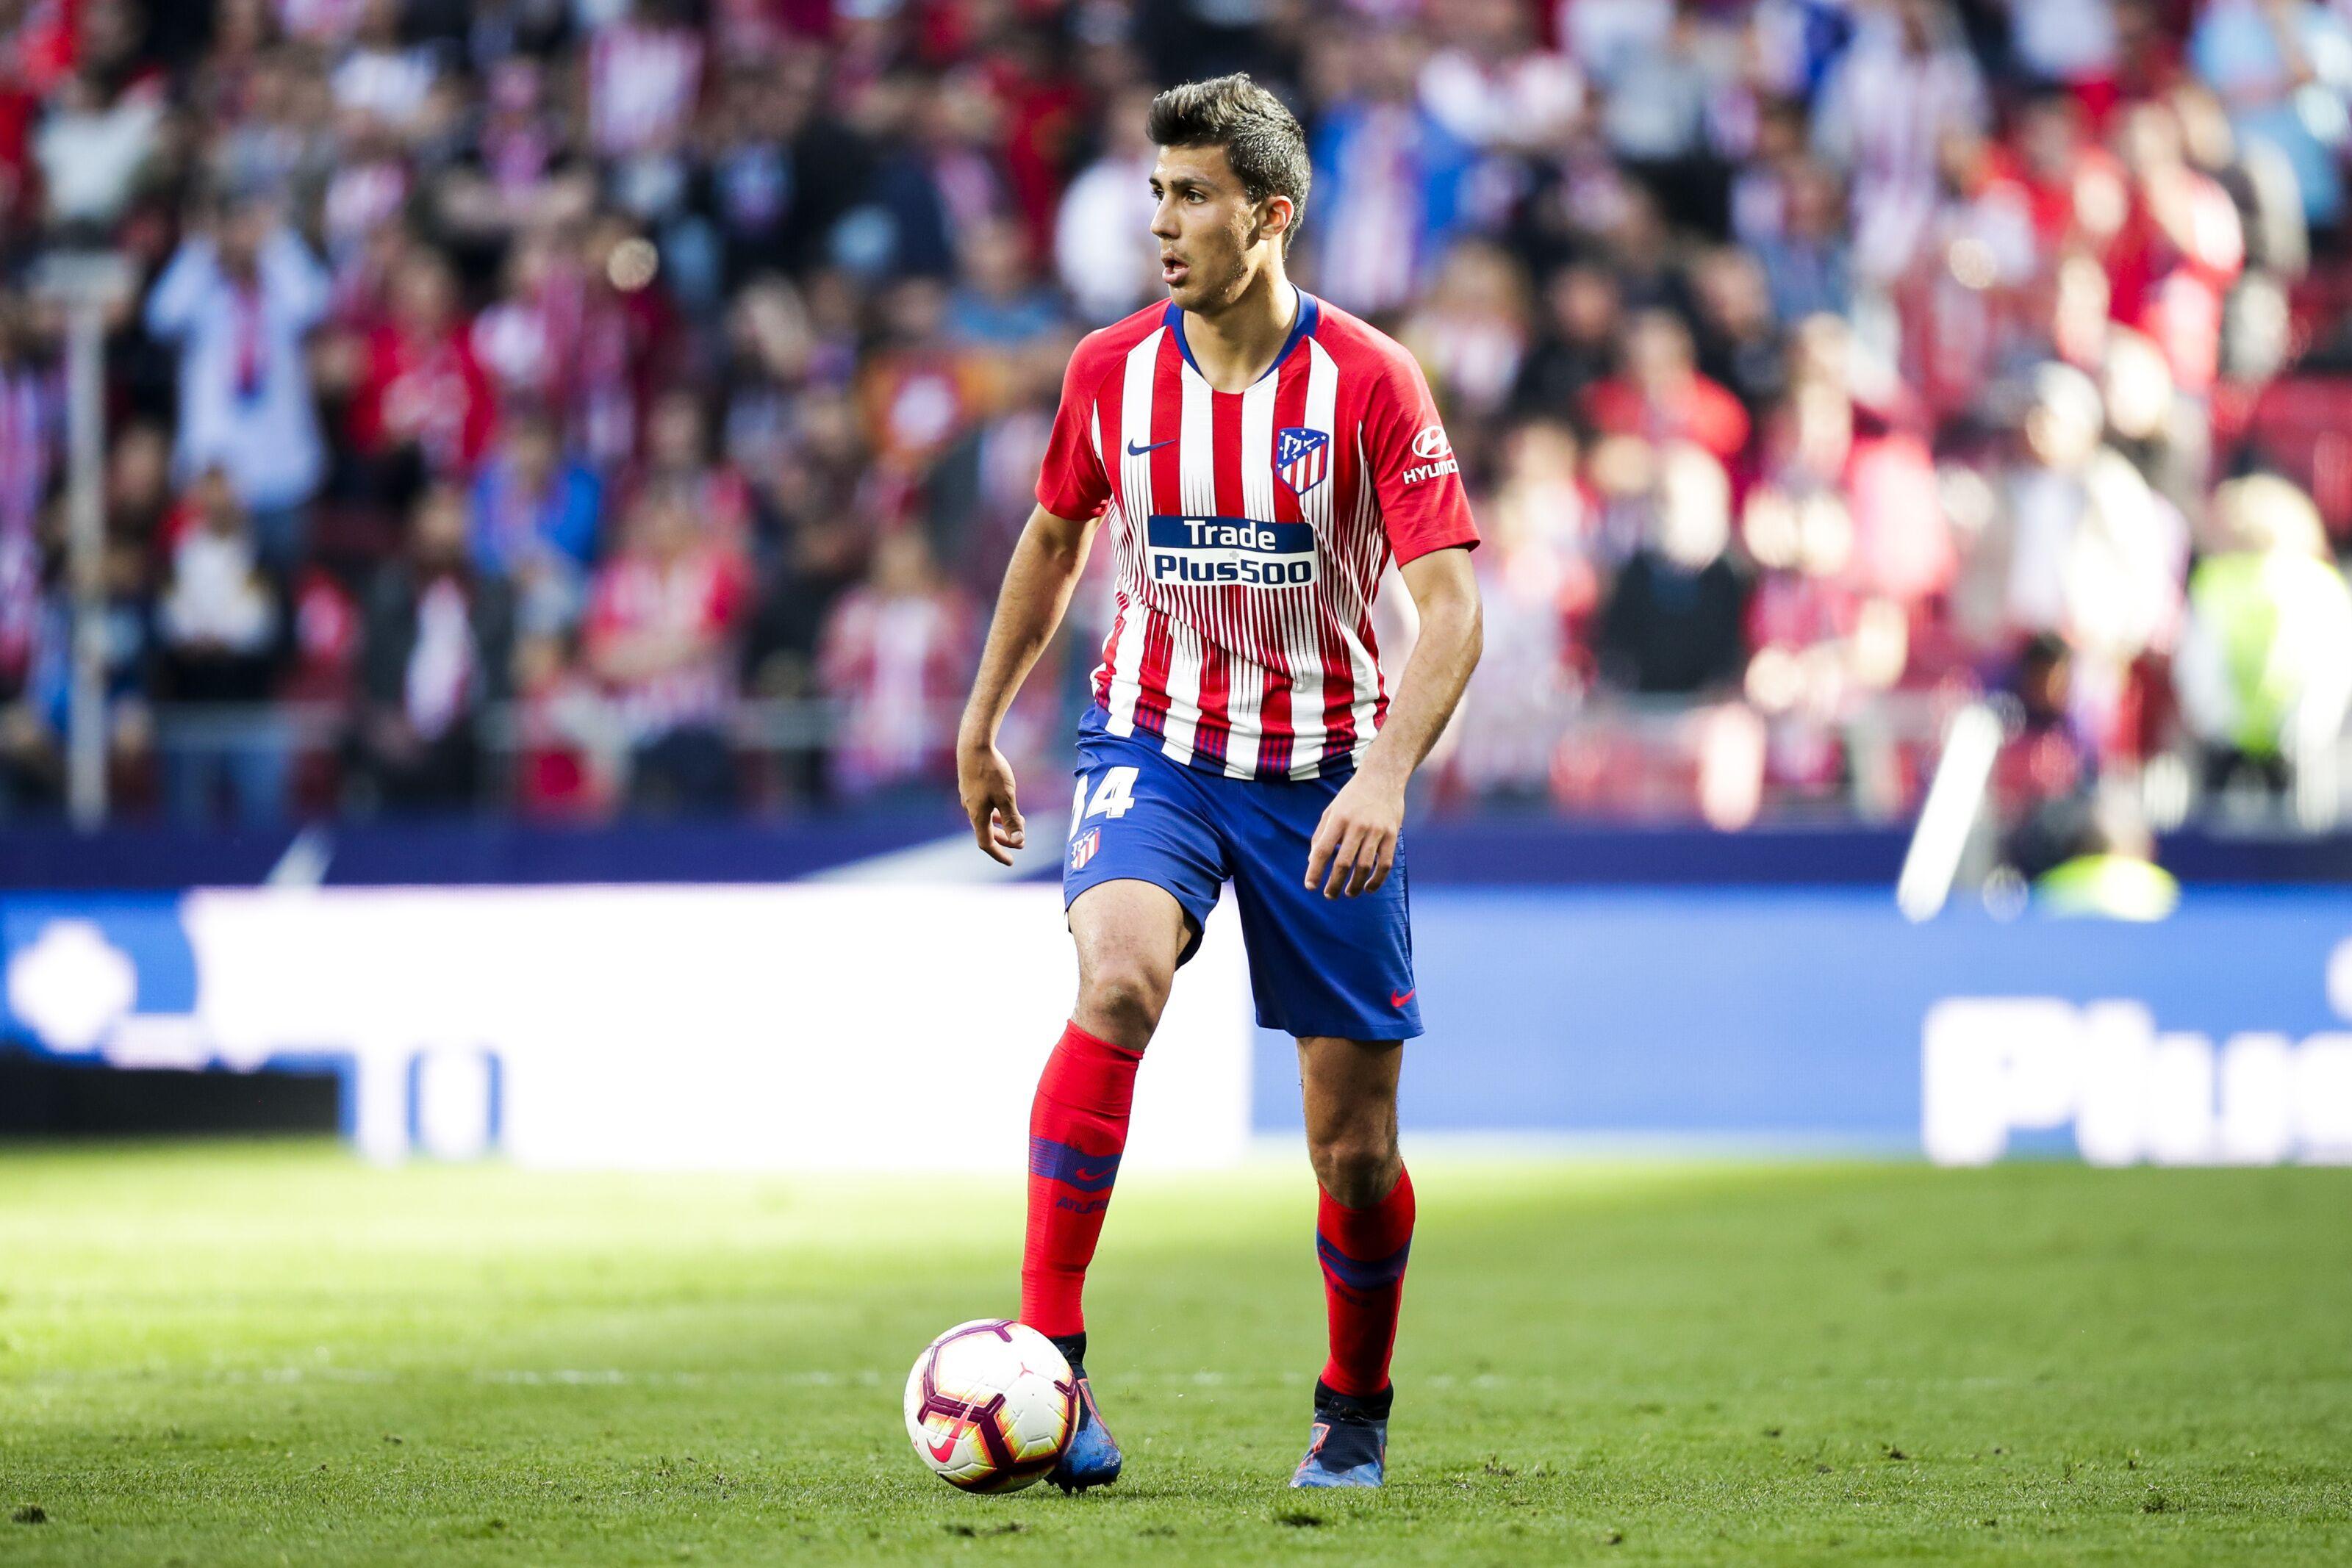 Gabi's successor at Atlu00e9tico slowly emerges as top Barcelona target